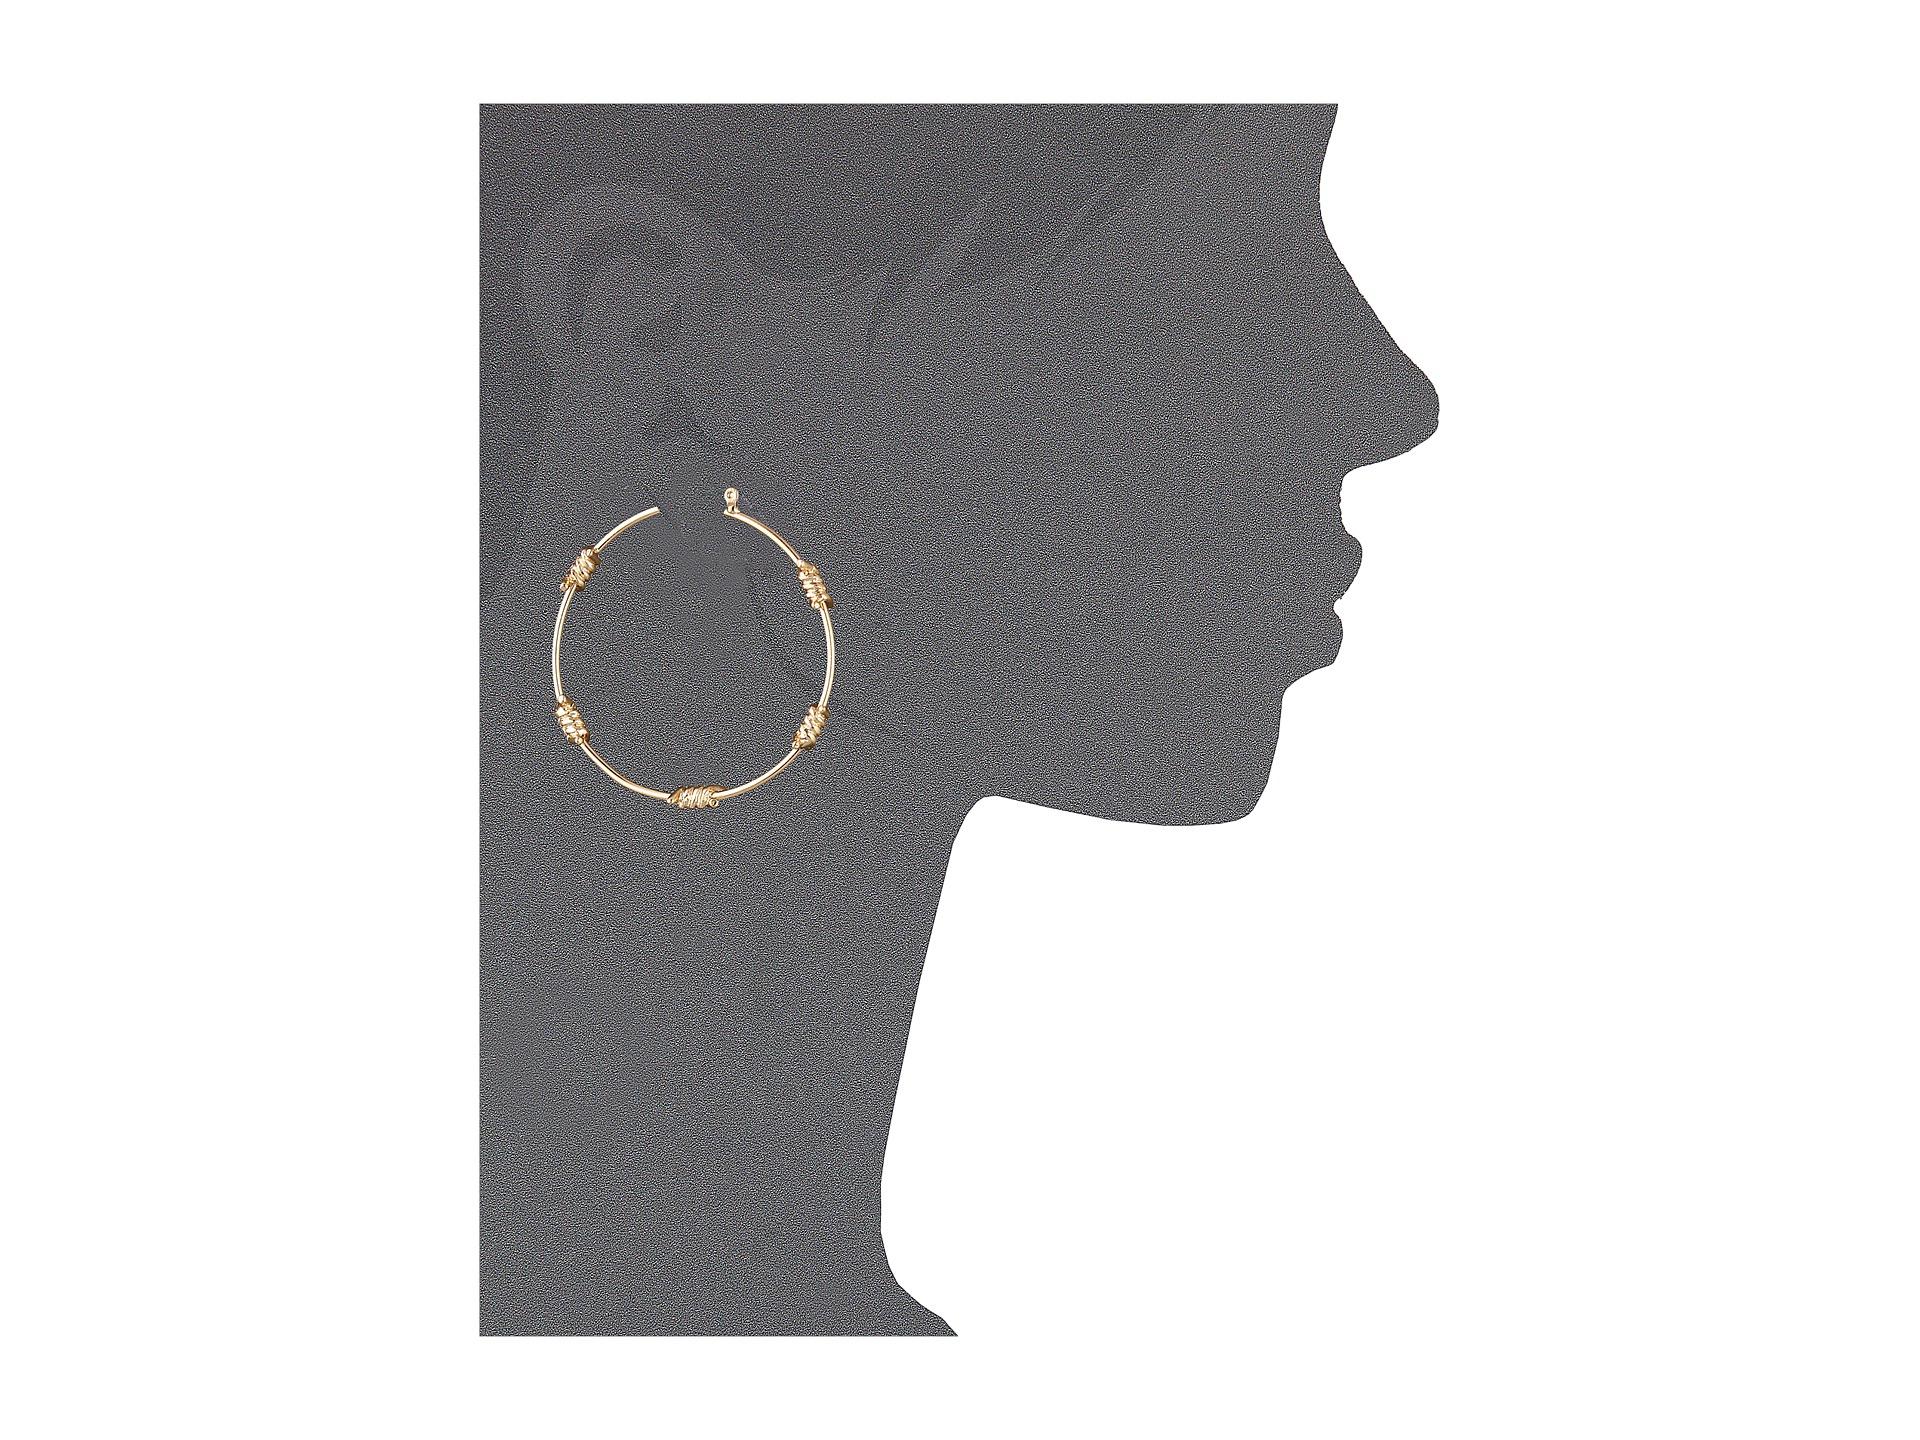 Lyst - Guess Barb Wire Hoop Earrings in Metallic